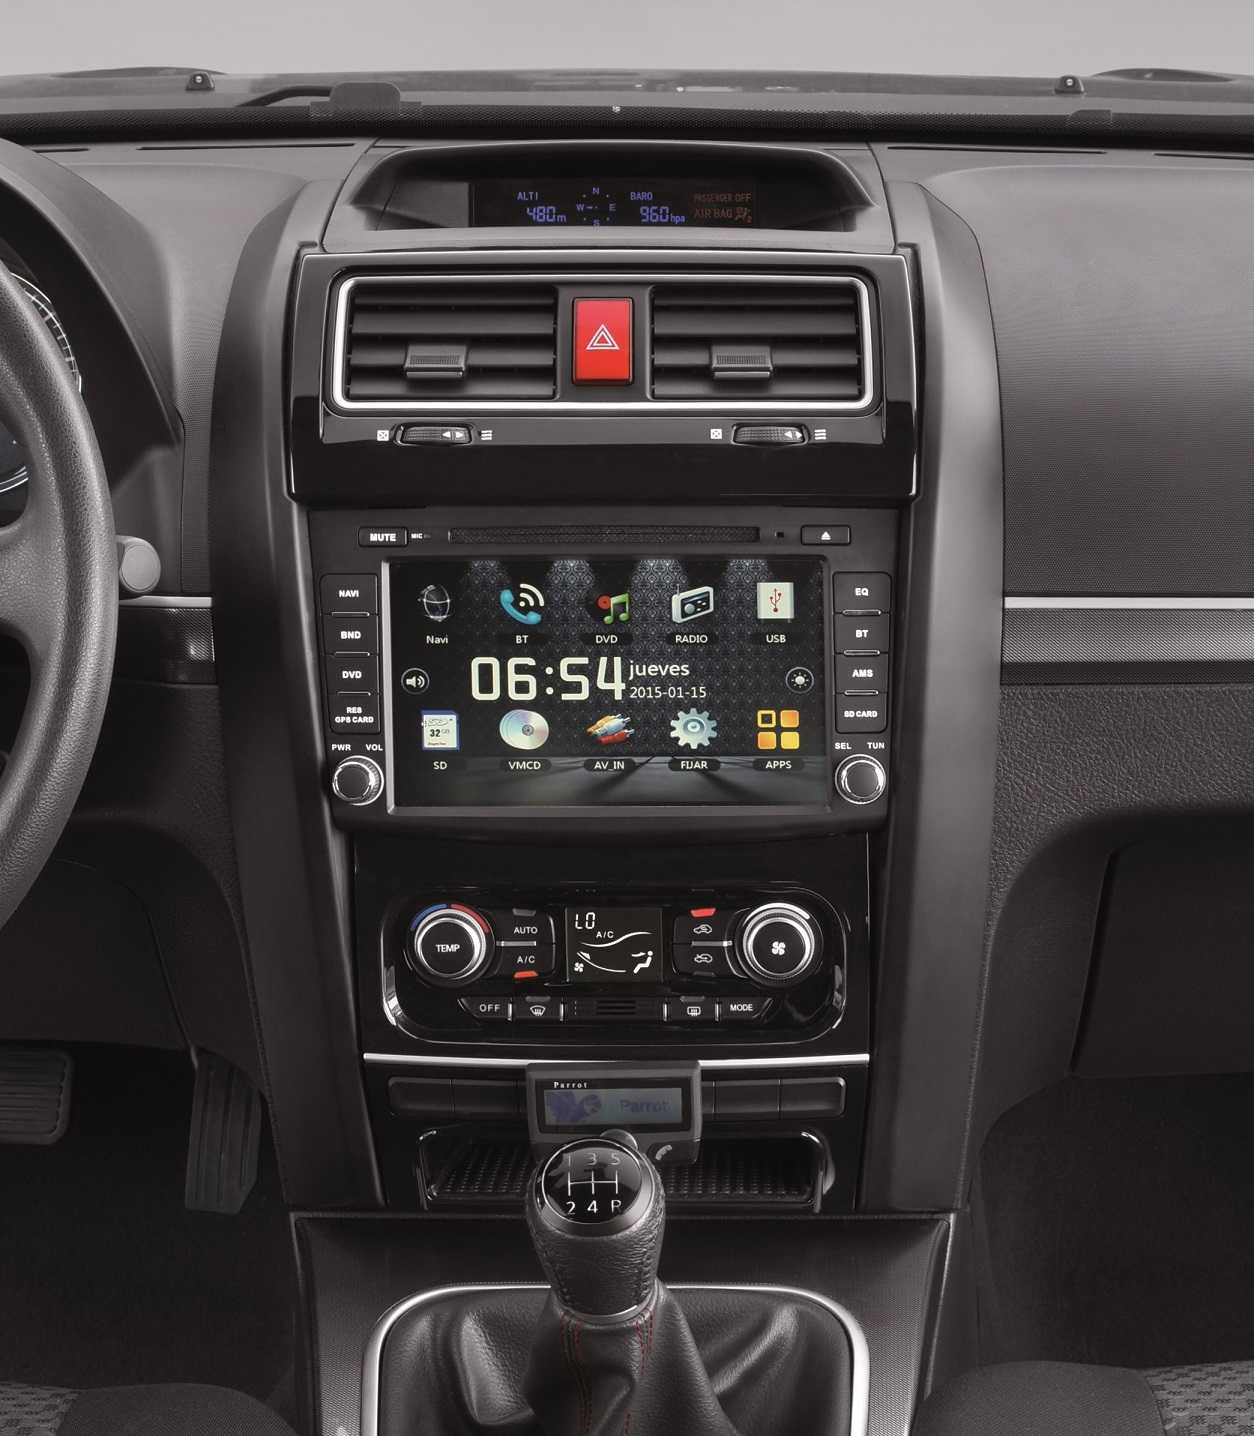 RADIO CONNECT H3 - 2